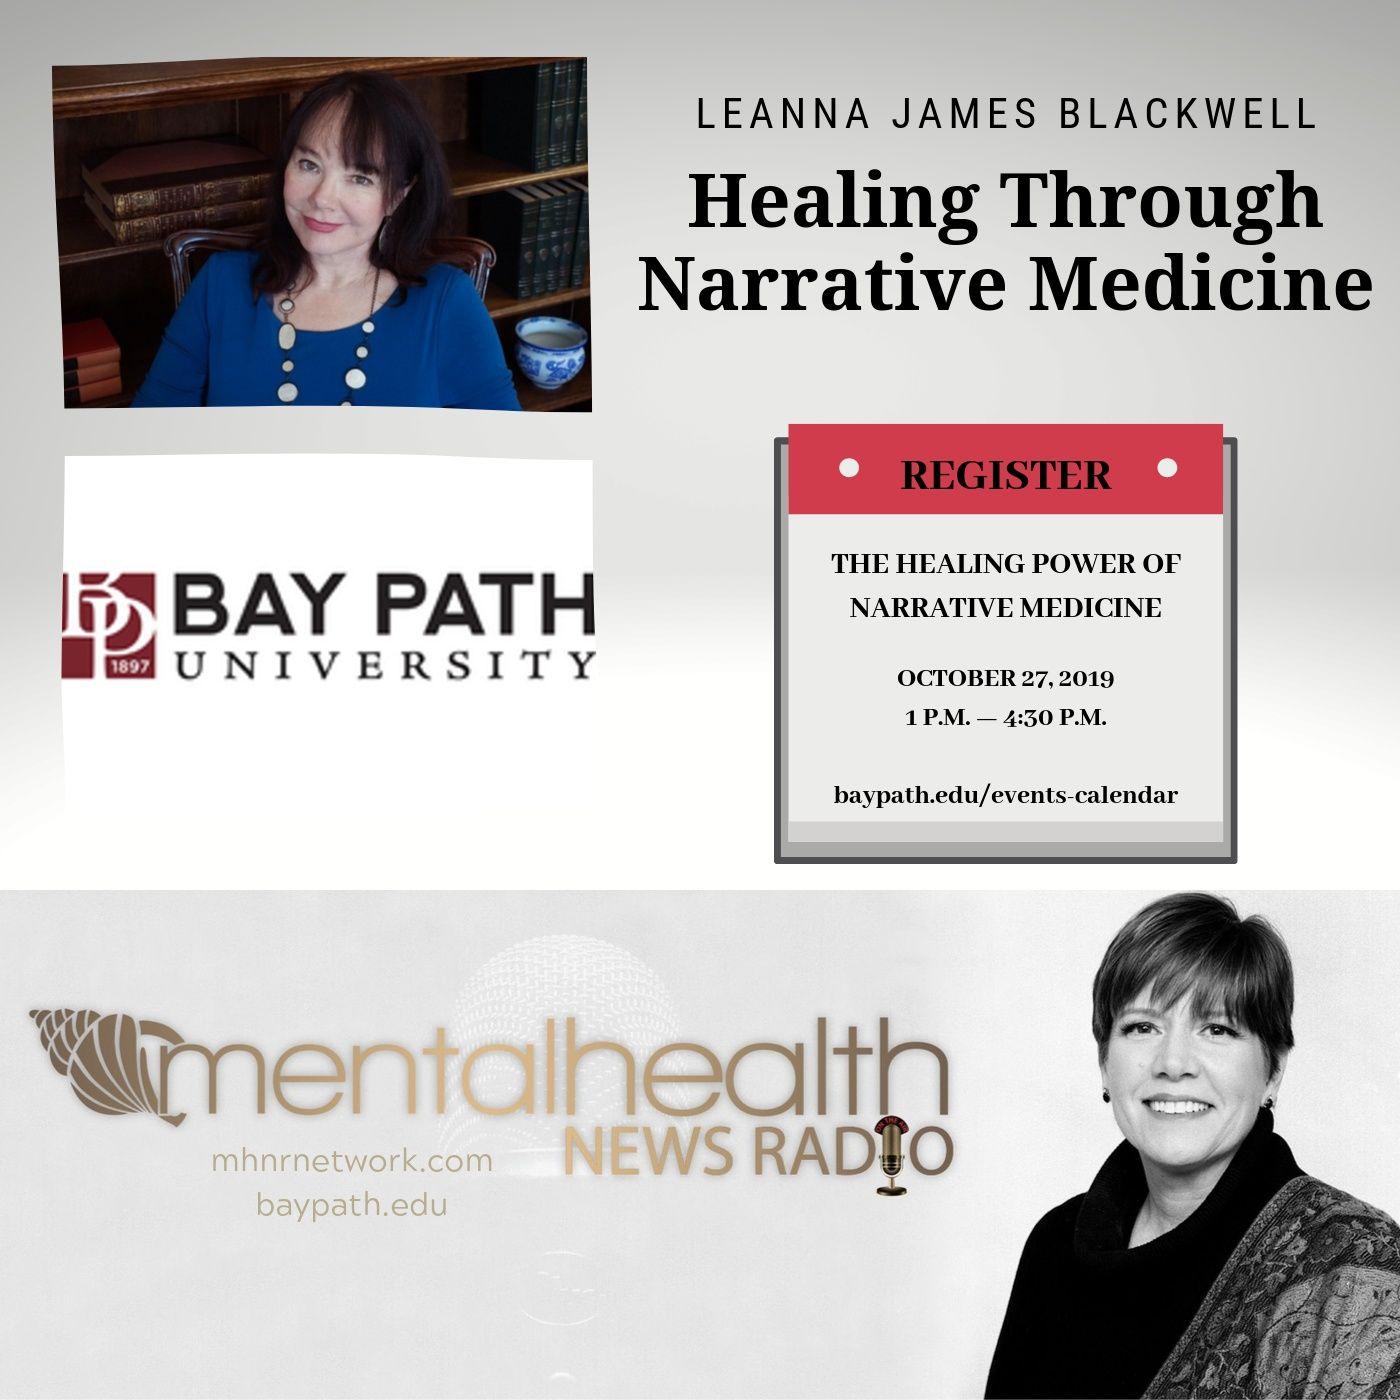 Mental Health News Radio - Healing Through Narrative Medicine